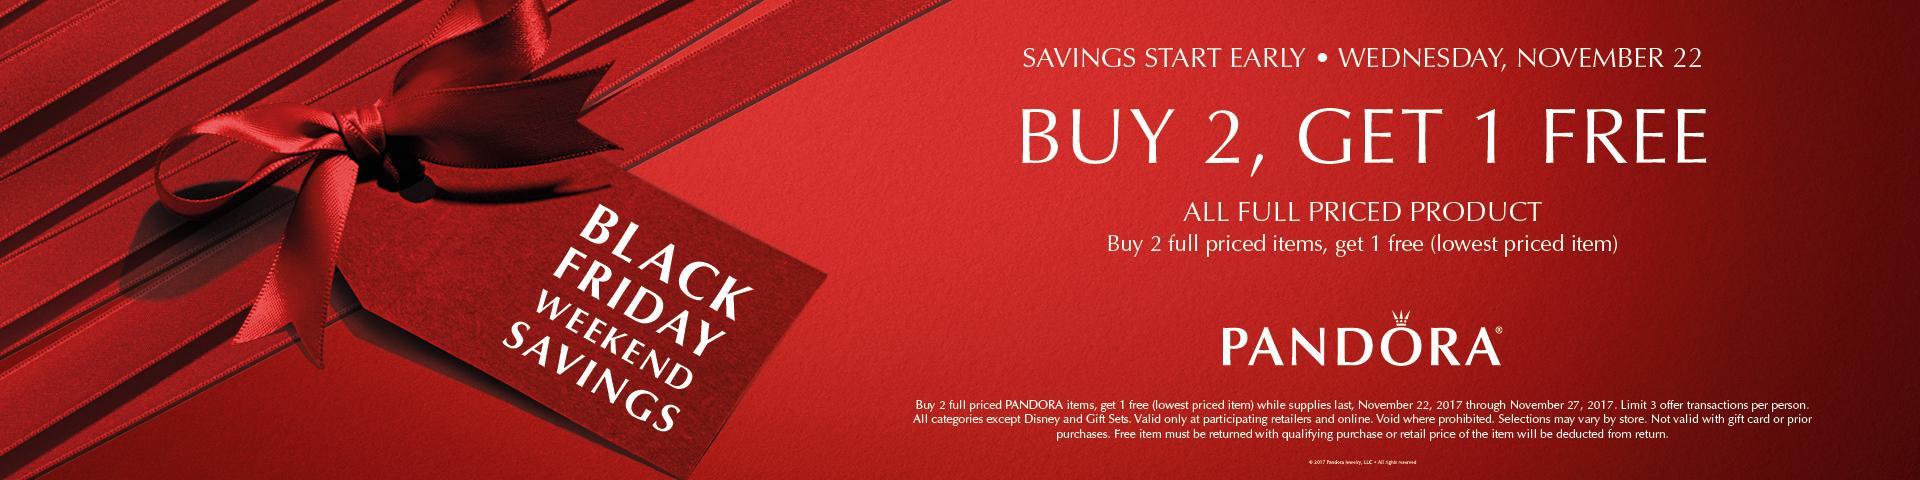 Pandora Black Friday Buy 2 Get 1